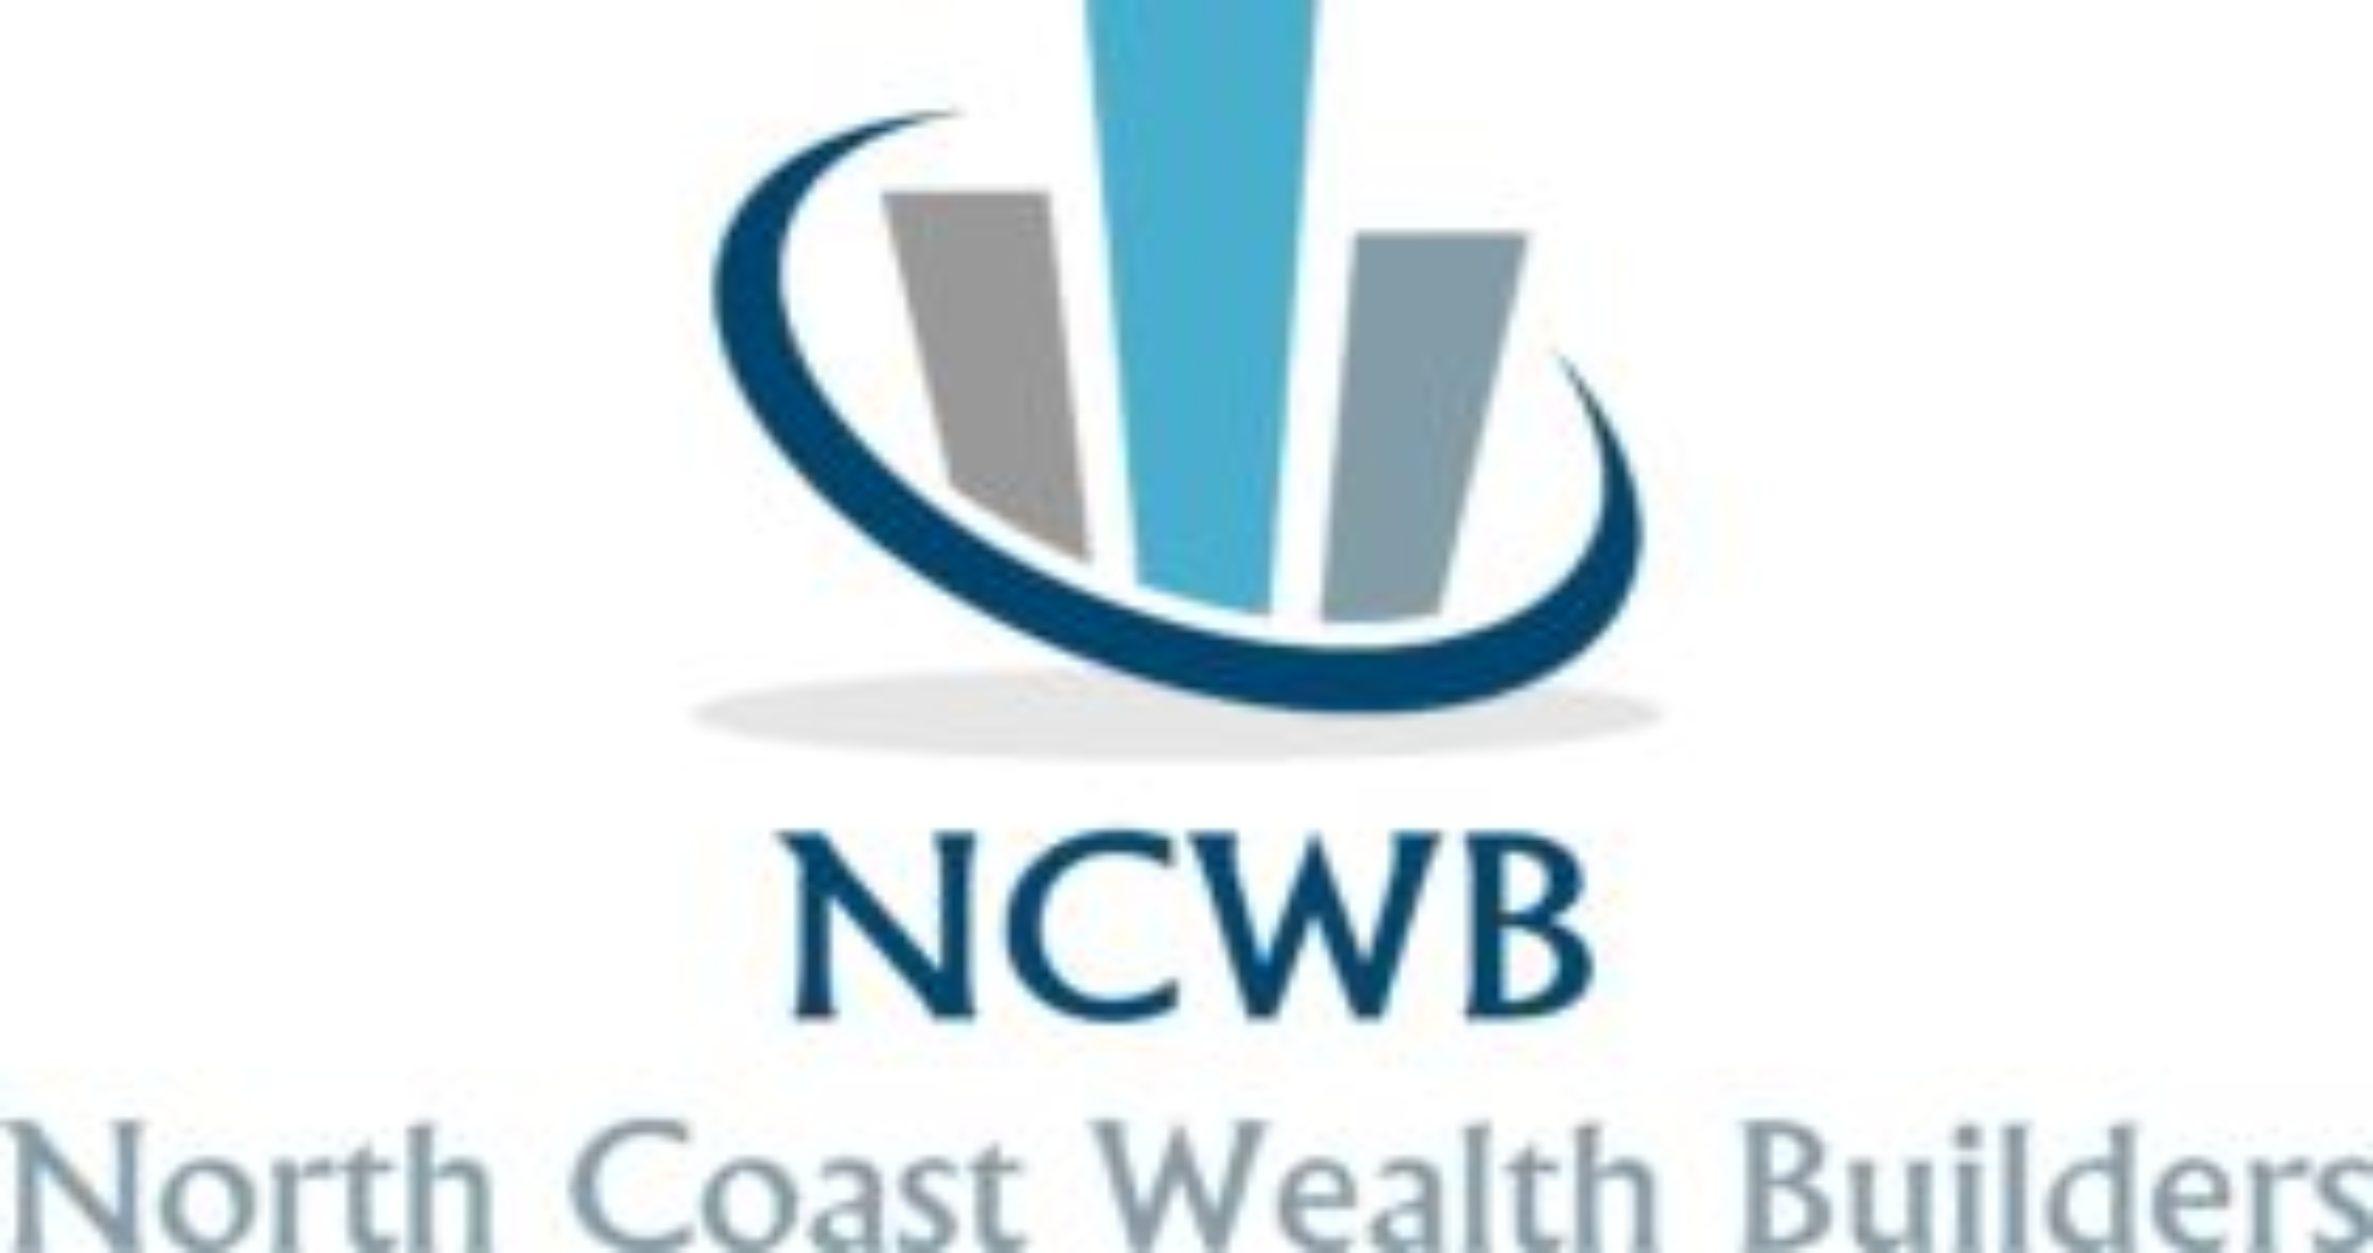 North Coast Wealth Builders